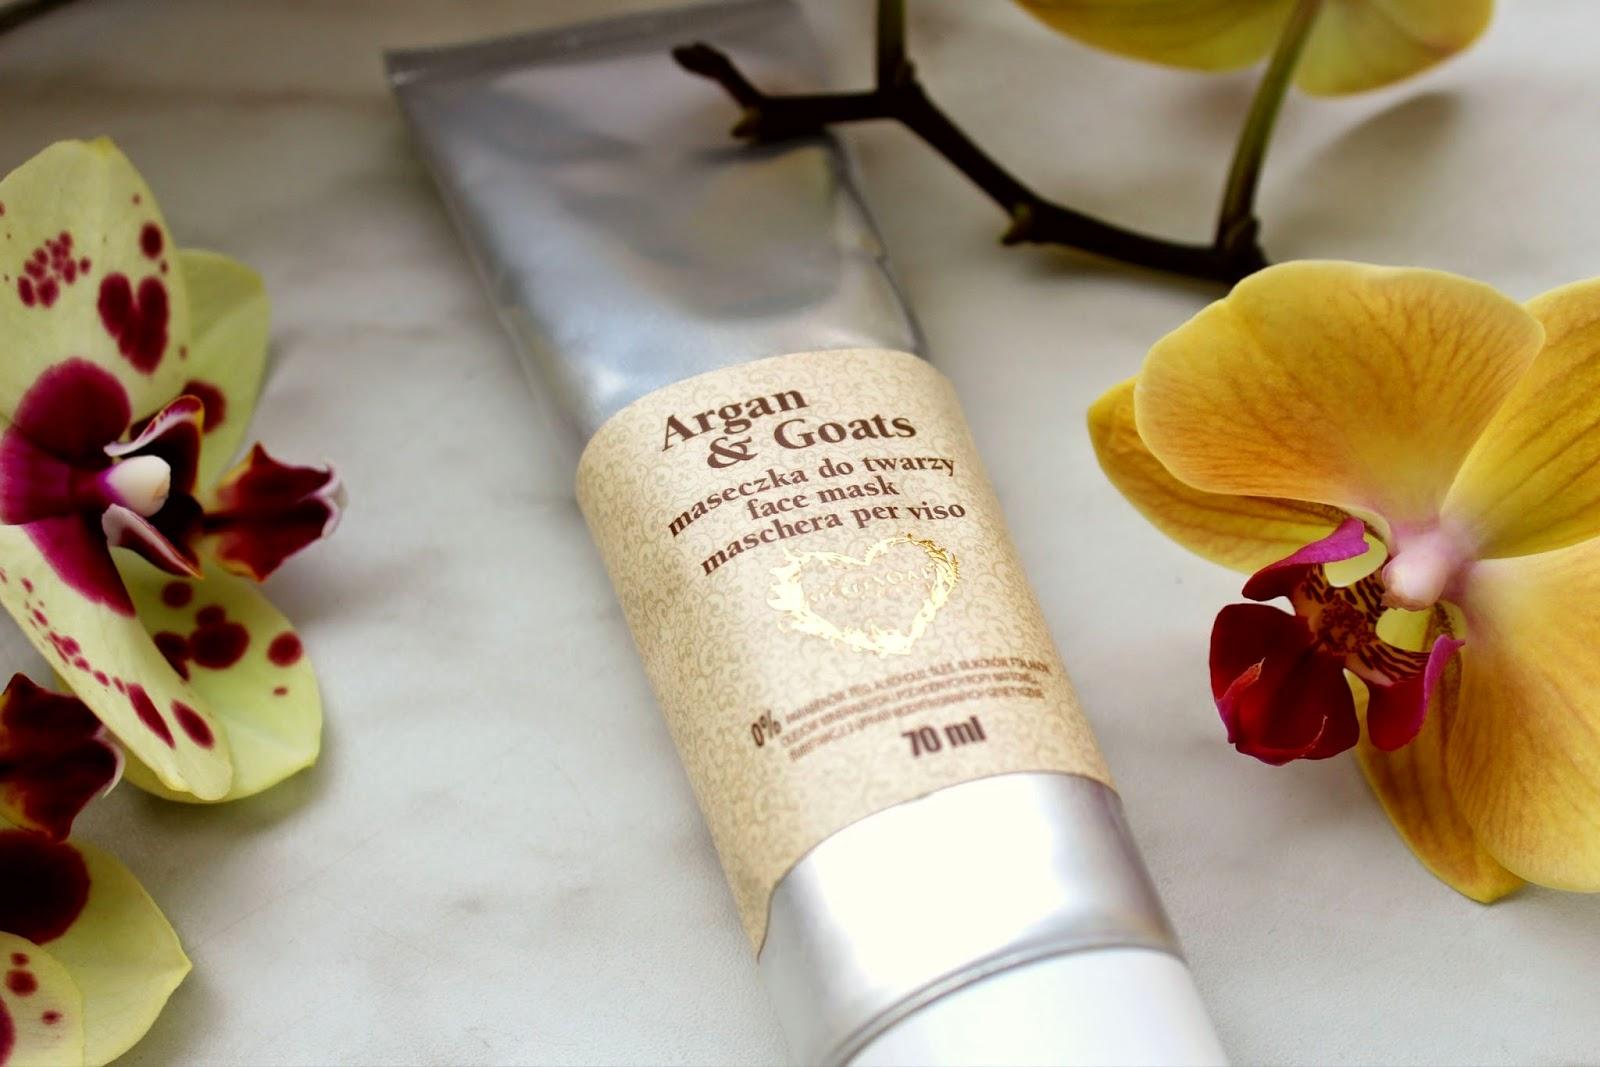 maseczka do twarzy Argan & Goats – The Secret Soap Store